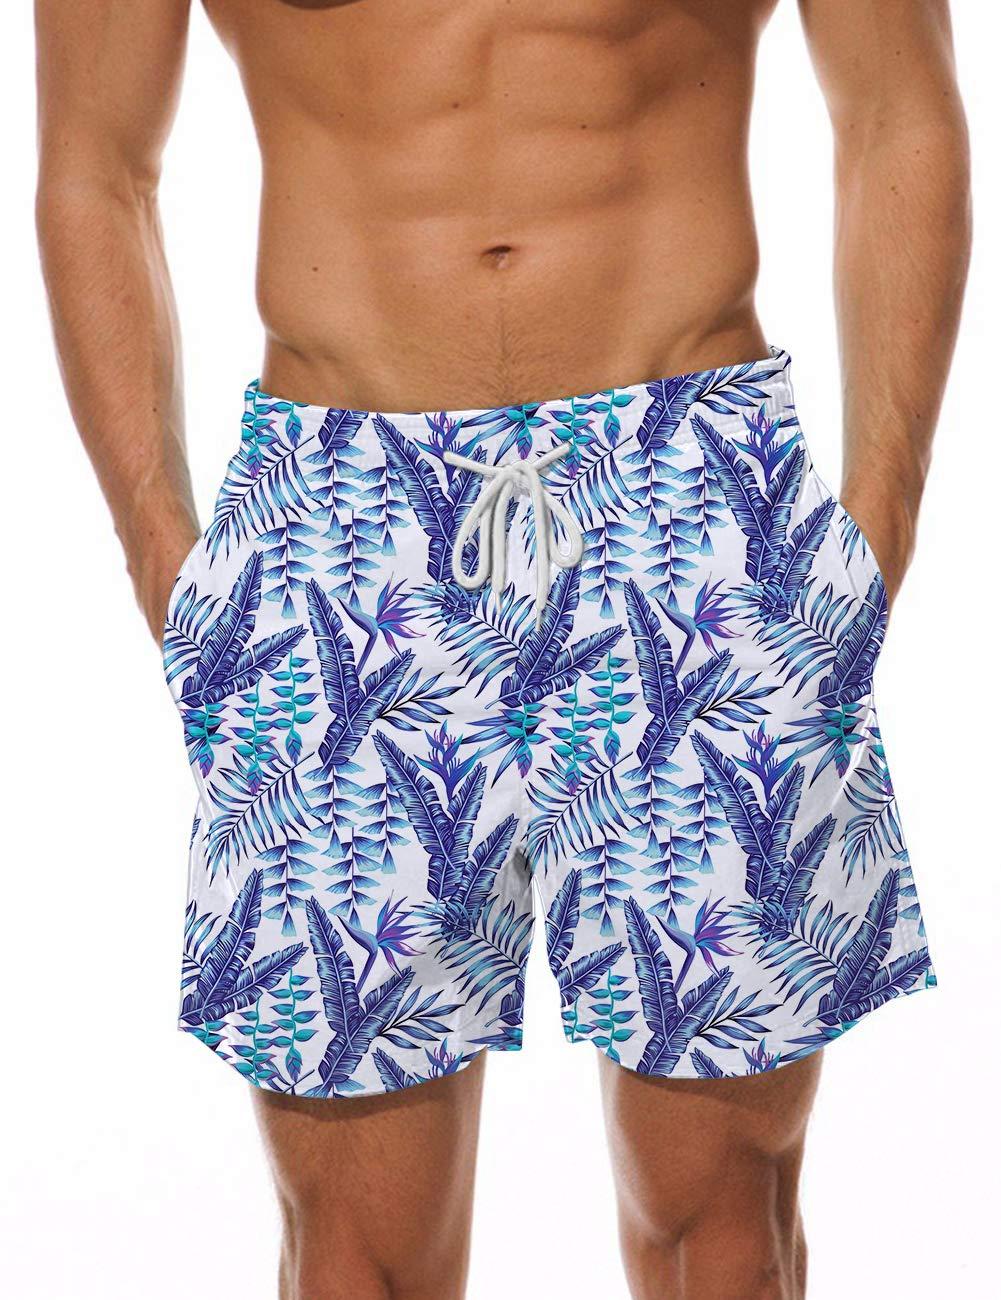 AIDEAONE Teen Boys Swim Trunks Quick Dry 5'' Waterproof Beach Shorts Casual Hawaiian Surfing Pants Swimwear L